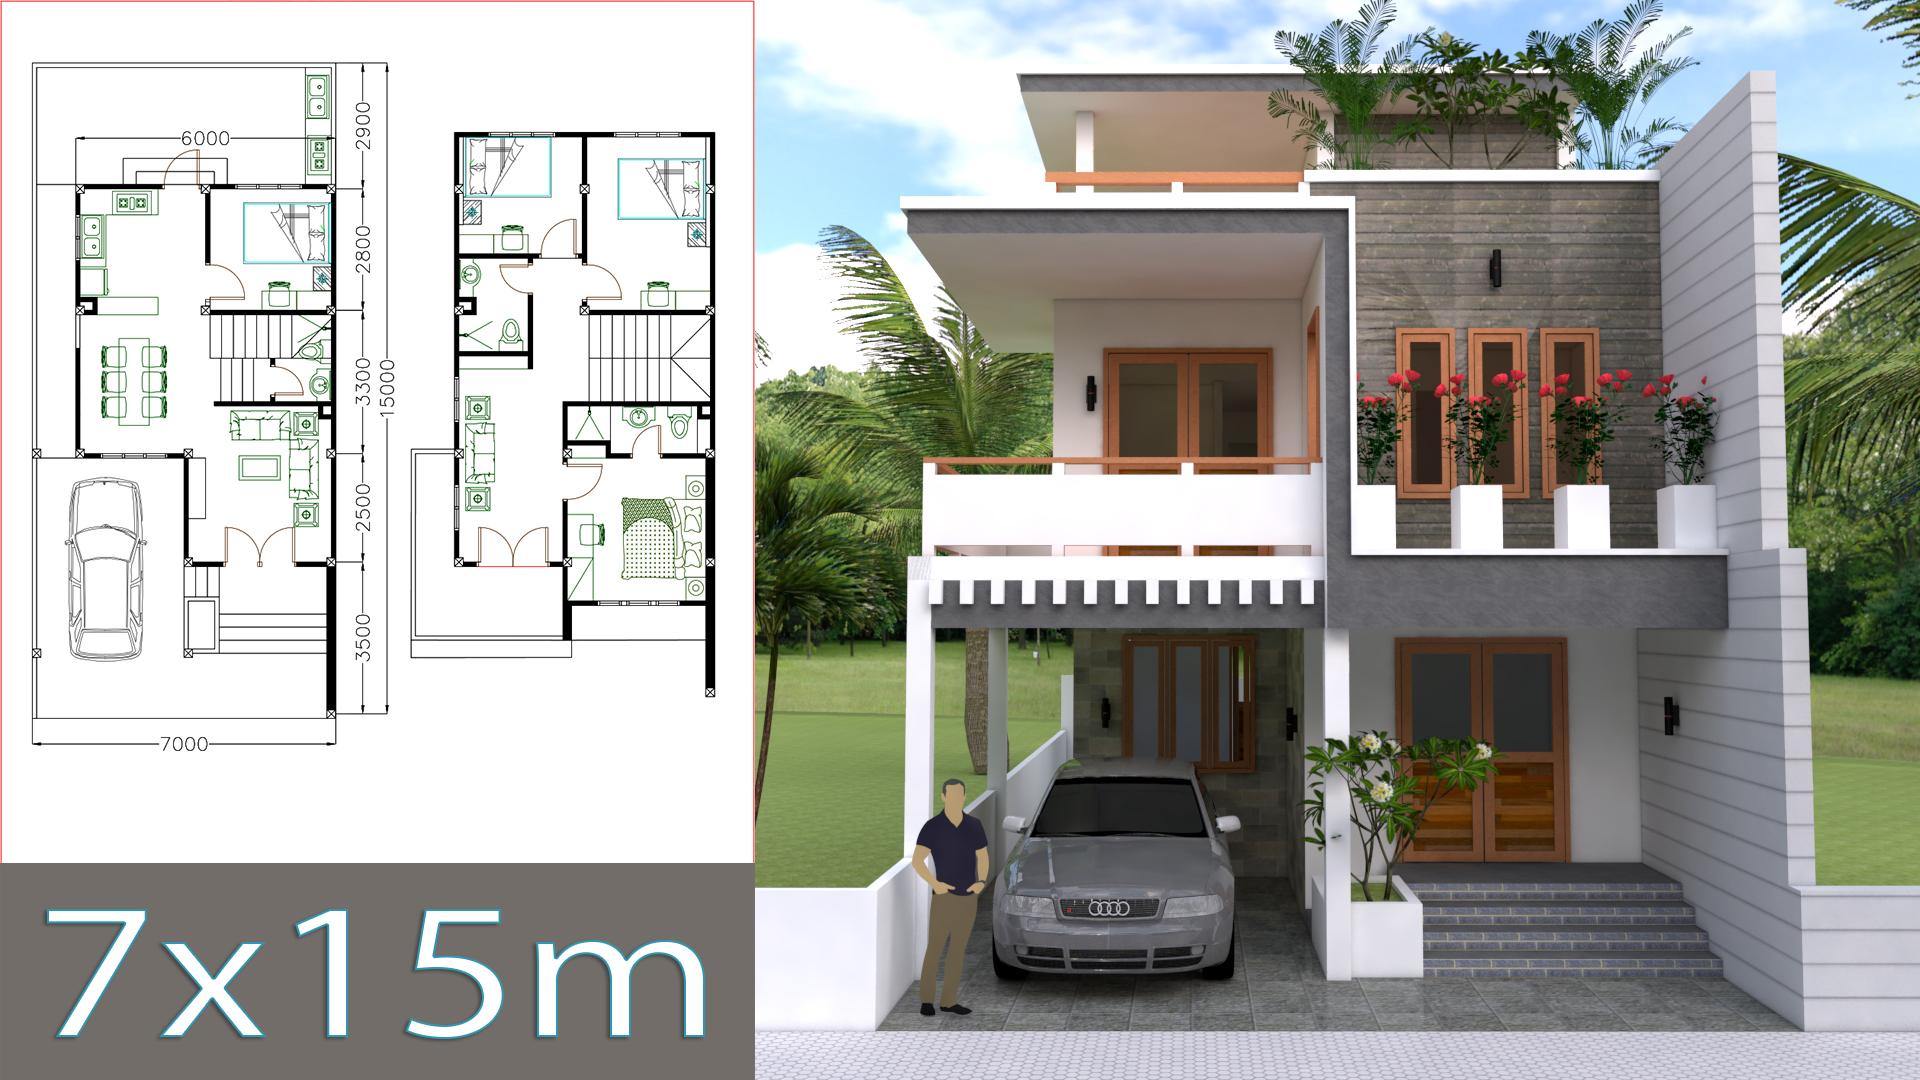 Home Design Plan 7x15m with 4 Bedrooms - Samphoas.Com